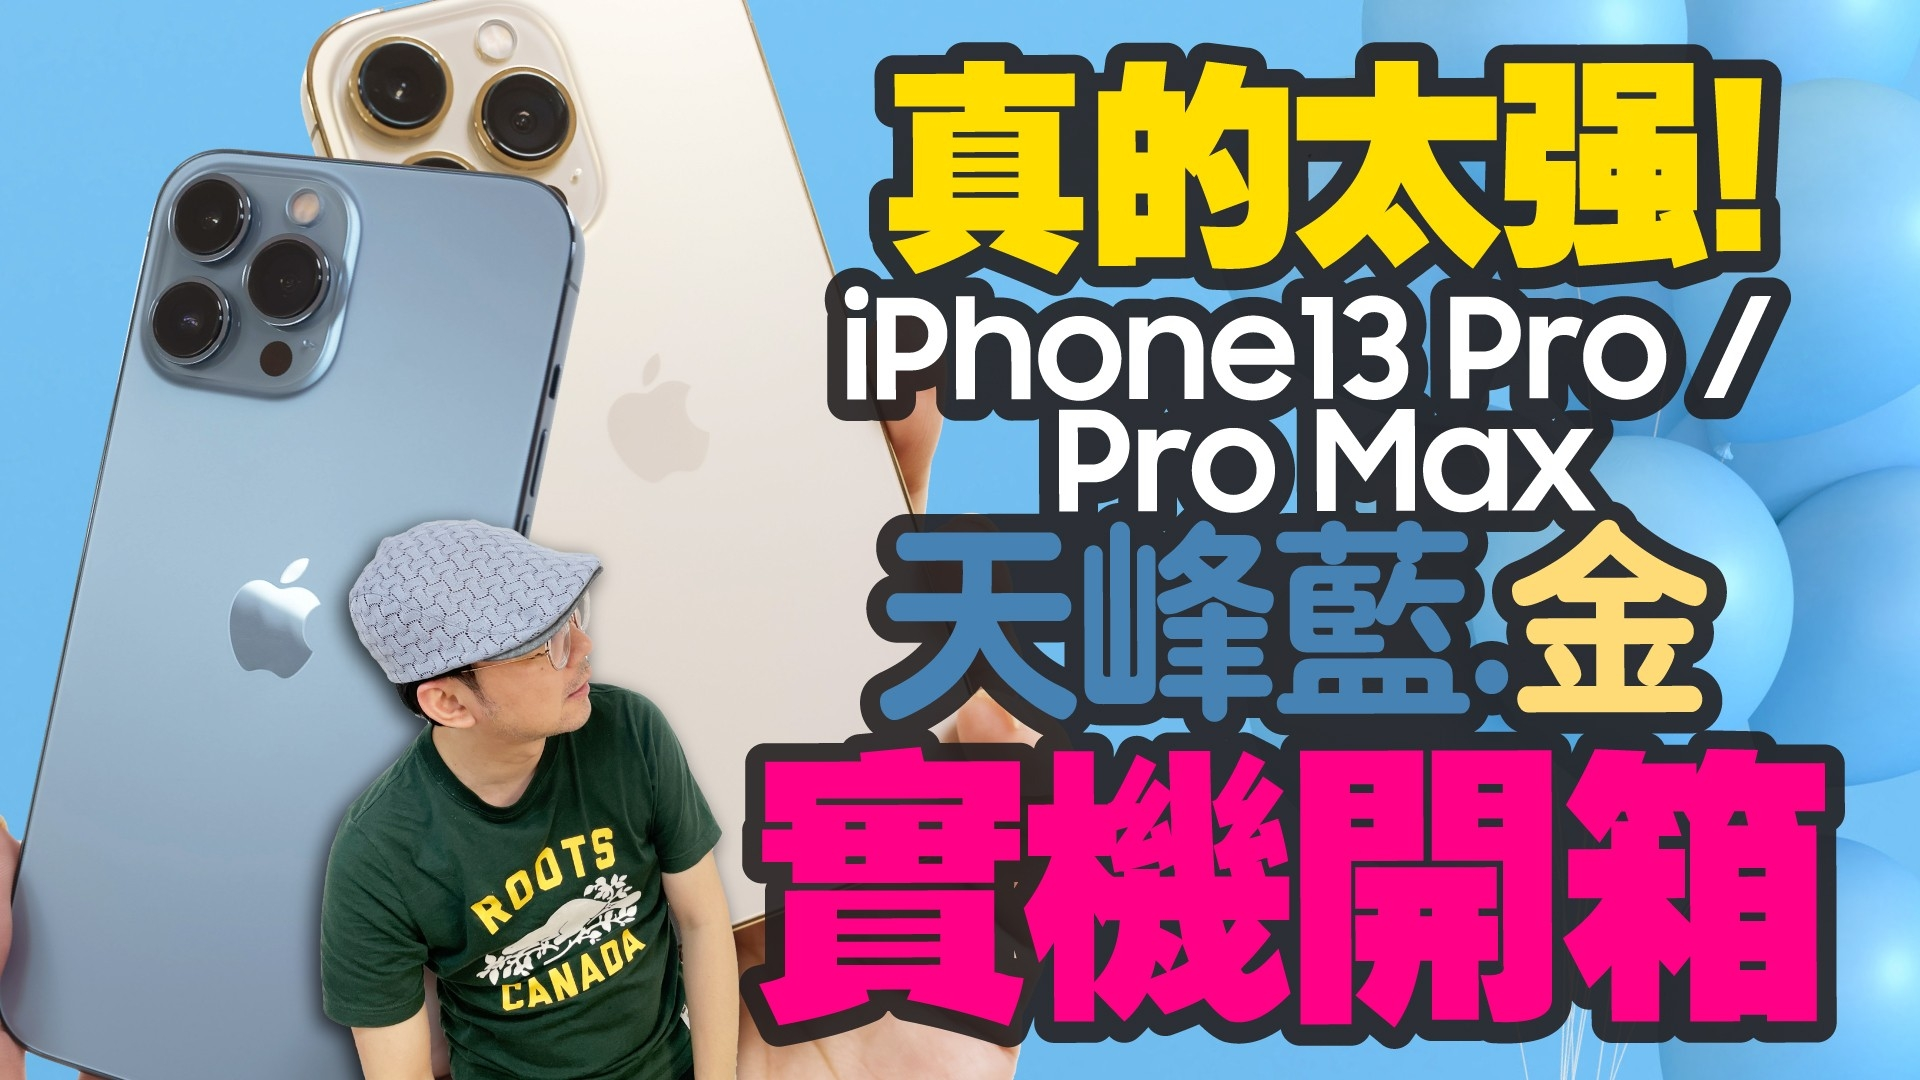 iPhone13 Pro_iPhone13 Pro Max開箱!天峰藍新色 實測跑分.耗電.螢幕更新率